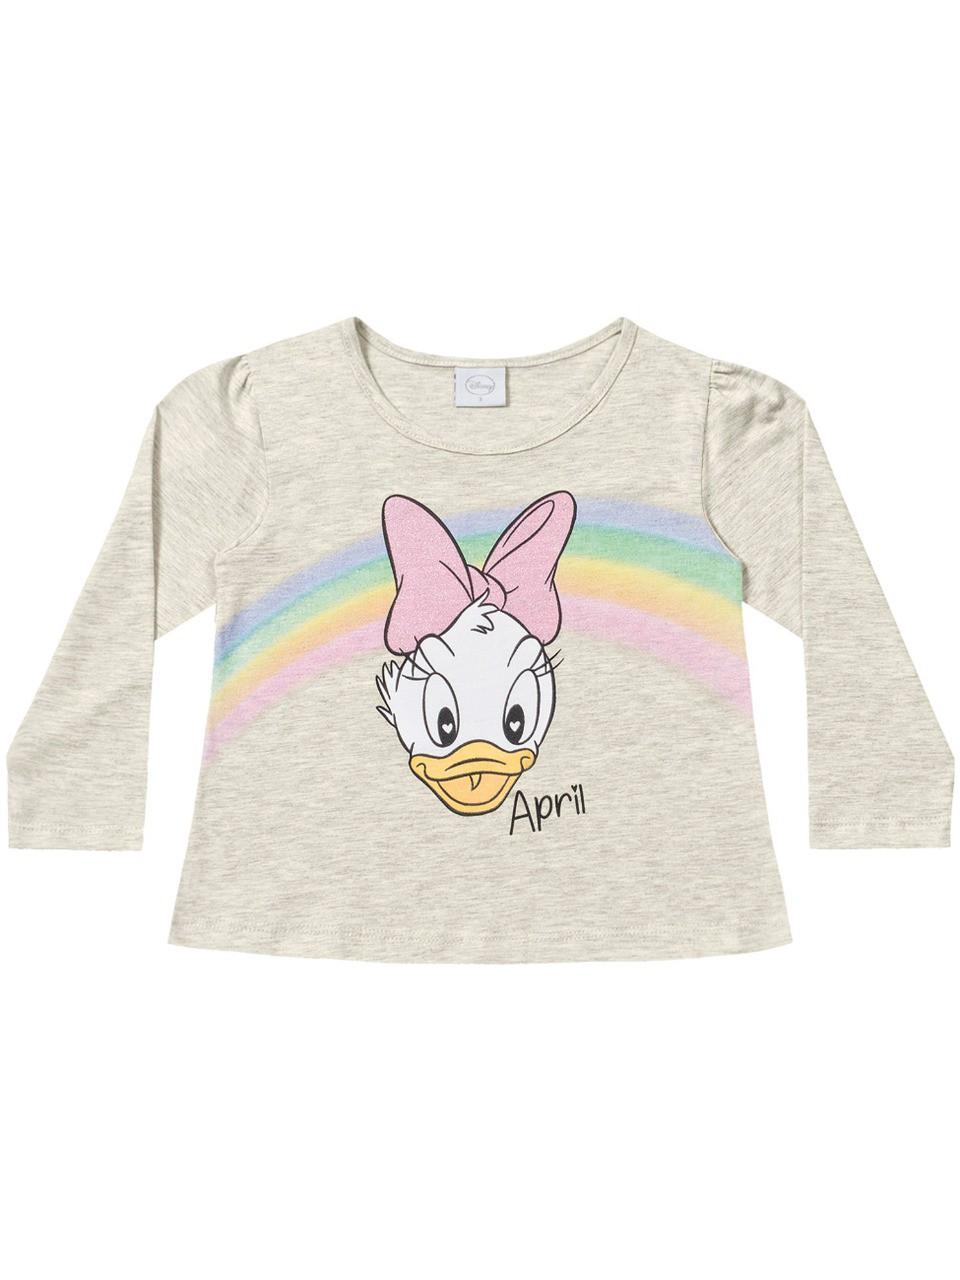 Blusa infantil feminina manga longa Margarida da Disney